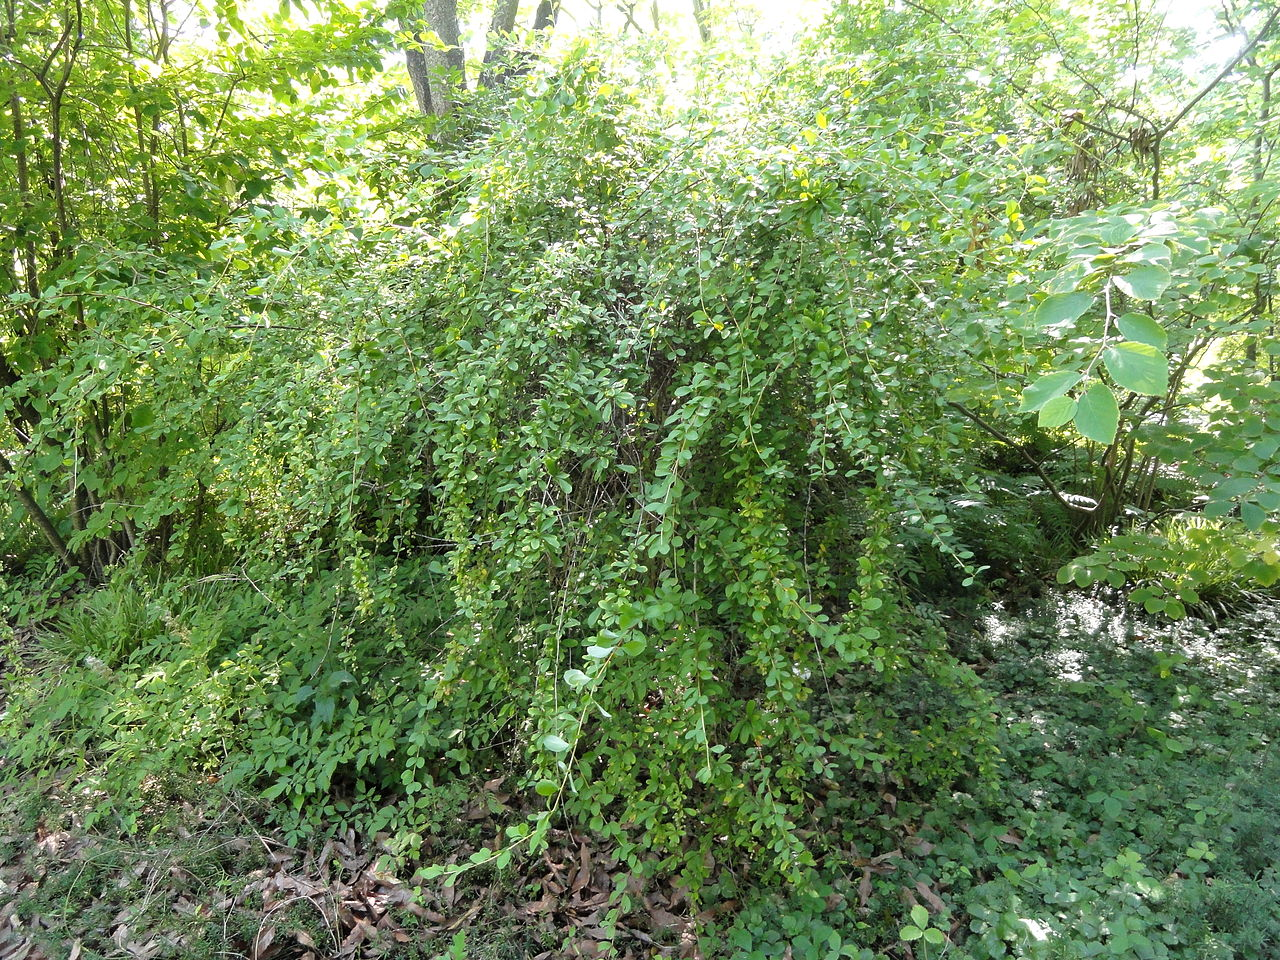 fil berberis vernae botanischer garten frankfurt am main dsc03272 jpg wikipedia. Black Bedroom Furniture Sets. Home Design Ideas